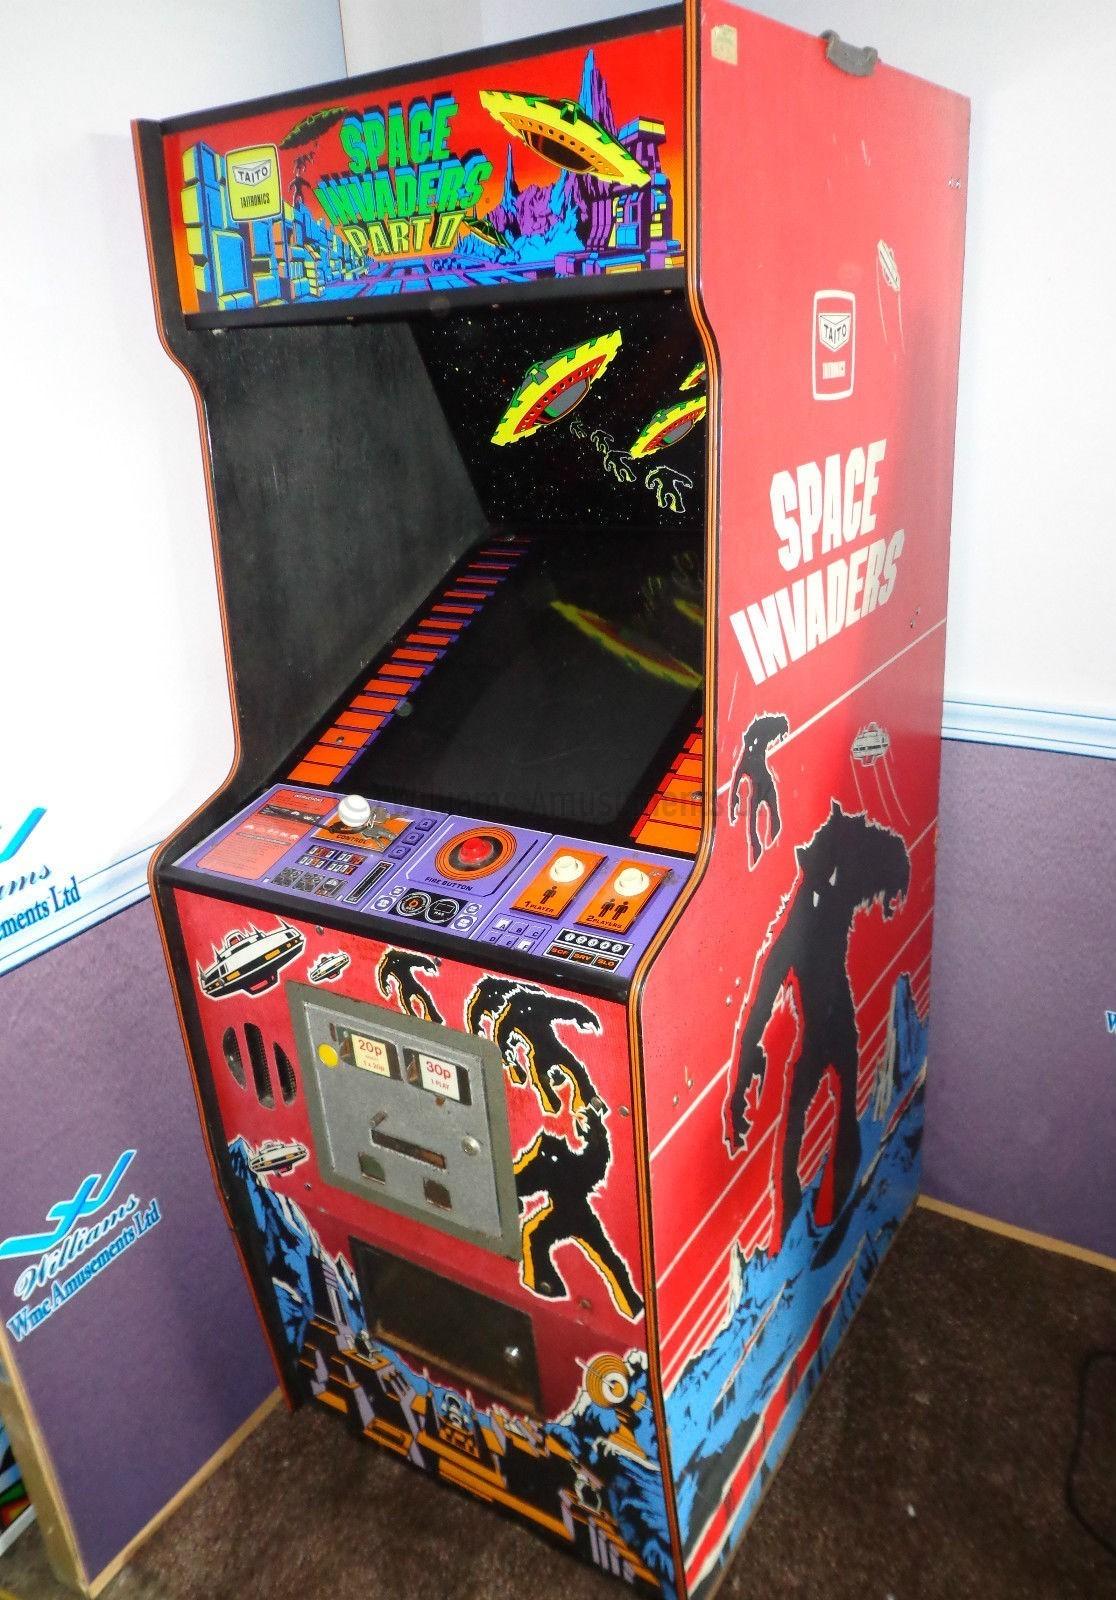 space invader arcade machine for sale